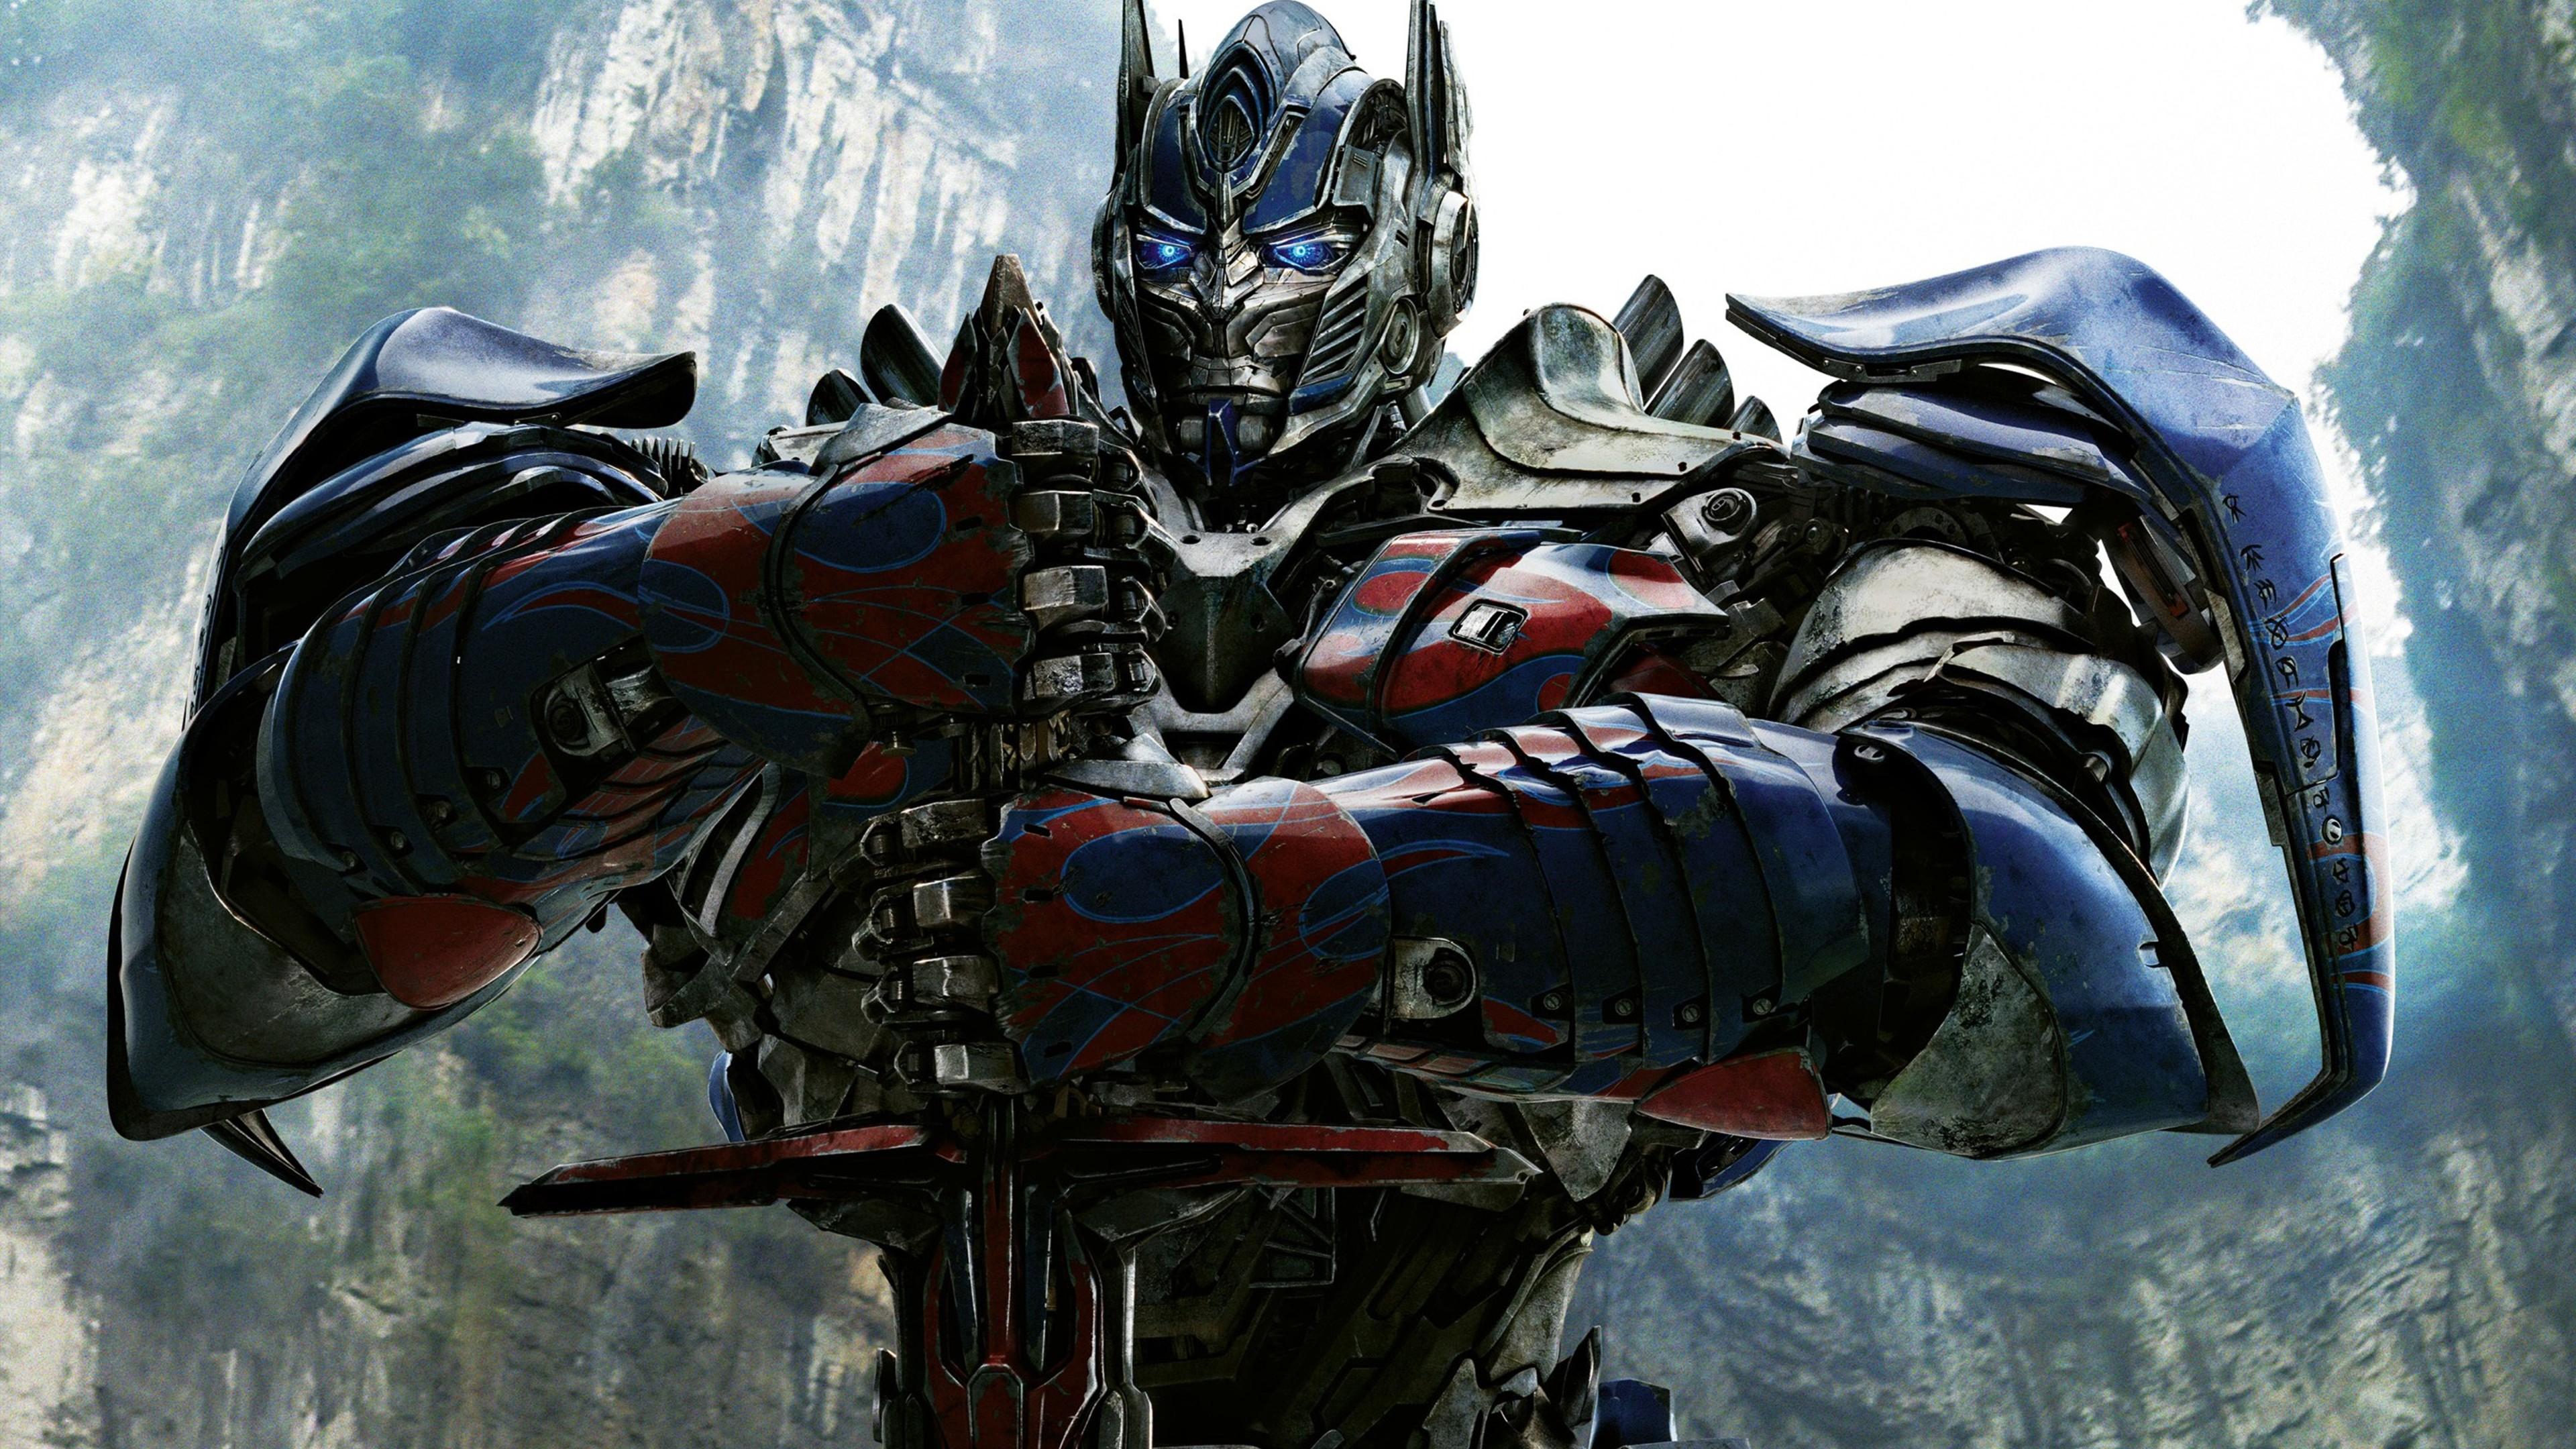 Optimus Prime Transformers Transformers Age Of Extinction Transformers Dark Of The Moon Transformers Wallpaper Resolution 3840x2160 Id 163649 Wallha Com